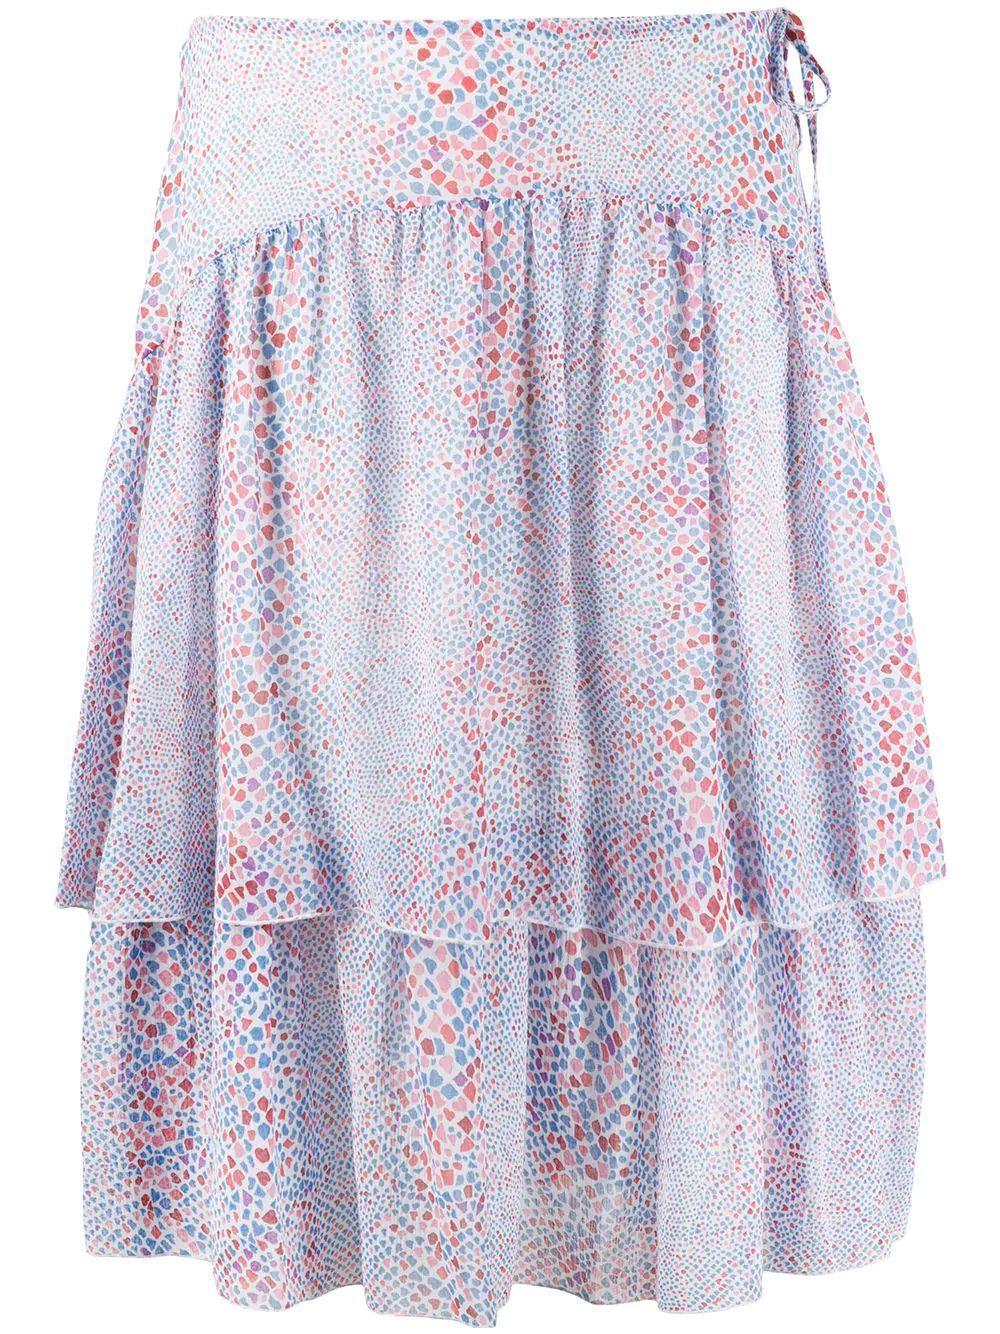 Python Print Silk Crepe Skirt Item # CHS20SJU13033